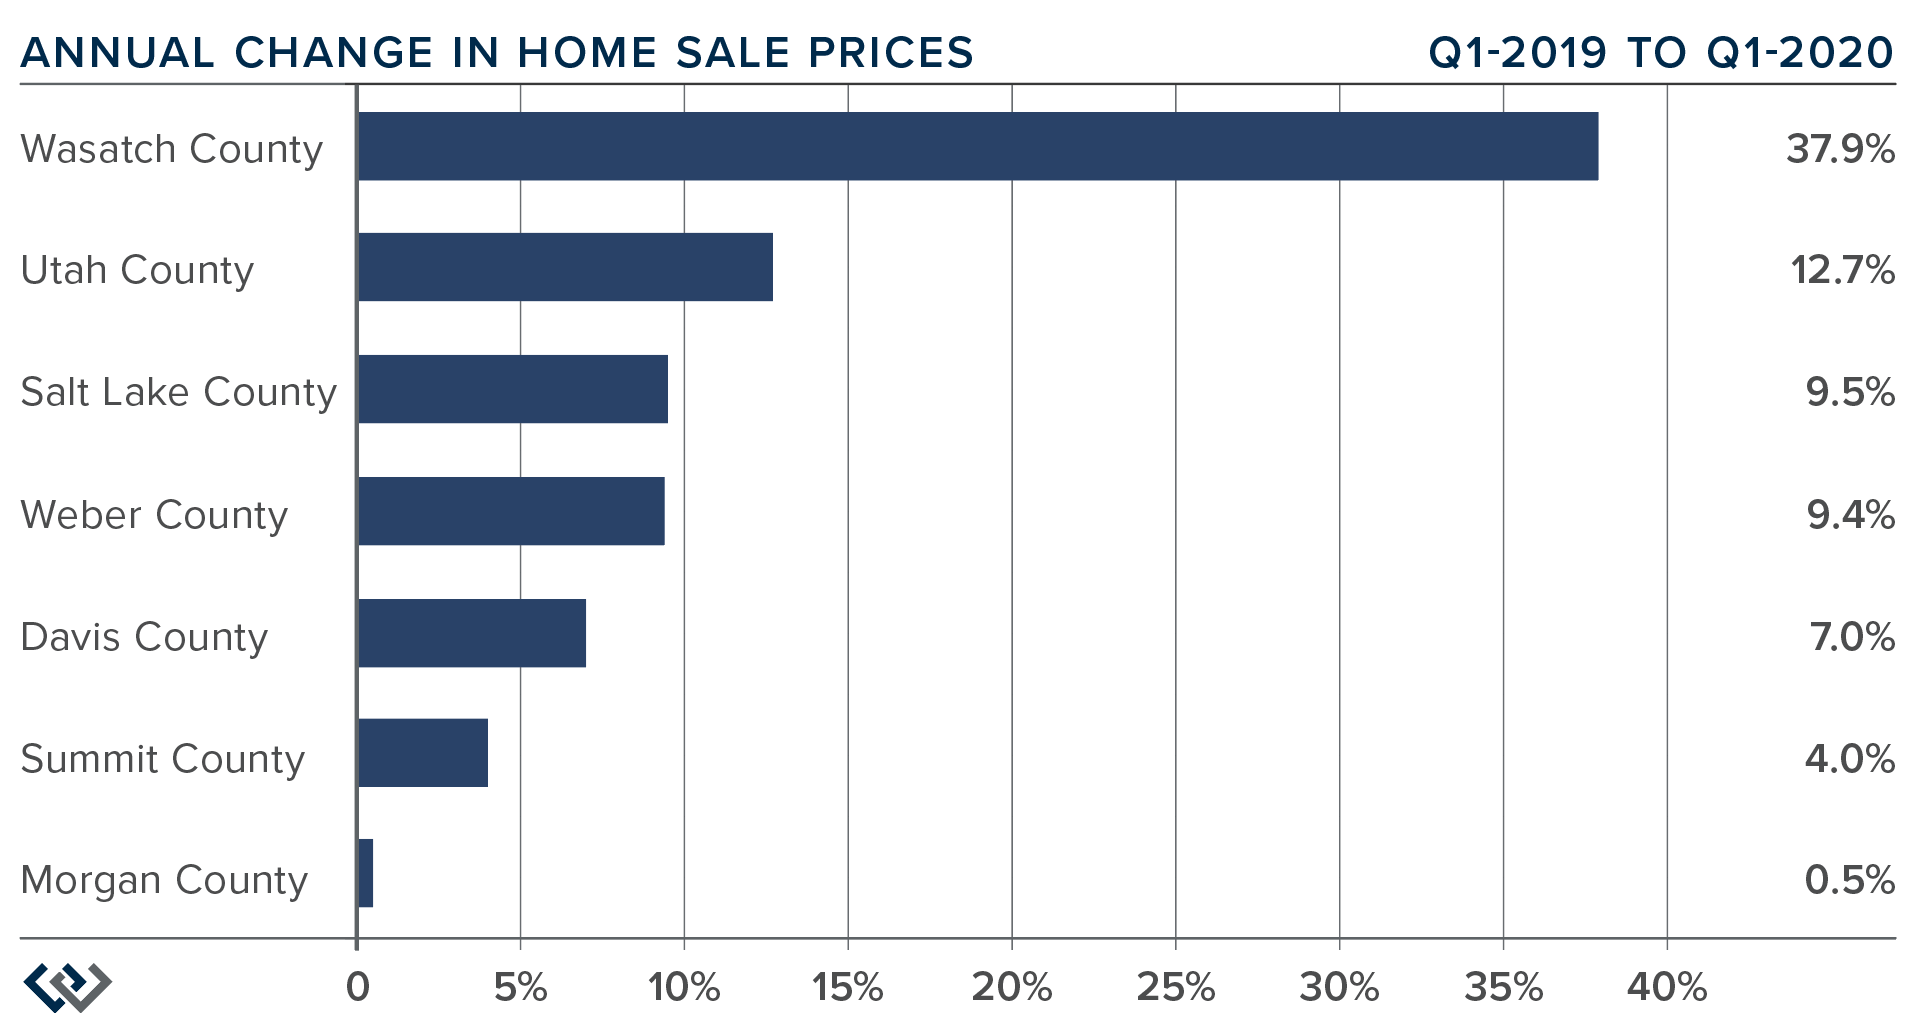 Windermere-Gardner-Report-Utah-Market-Trends-Annual-Change-Home-Sale-Prices-Quarter-1-2020